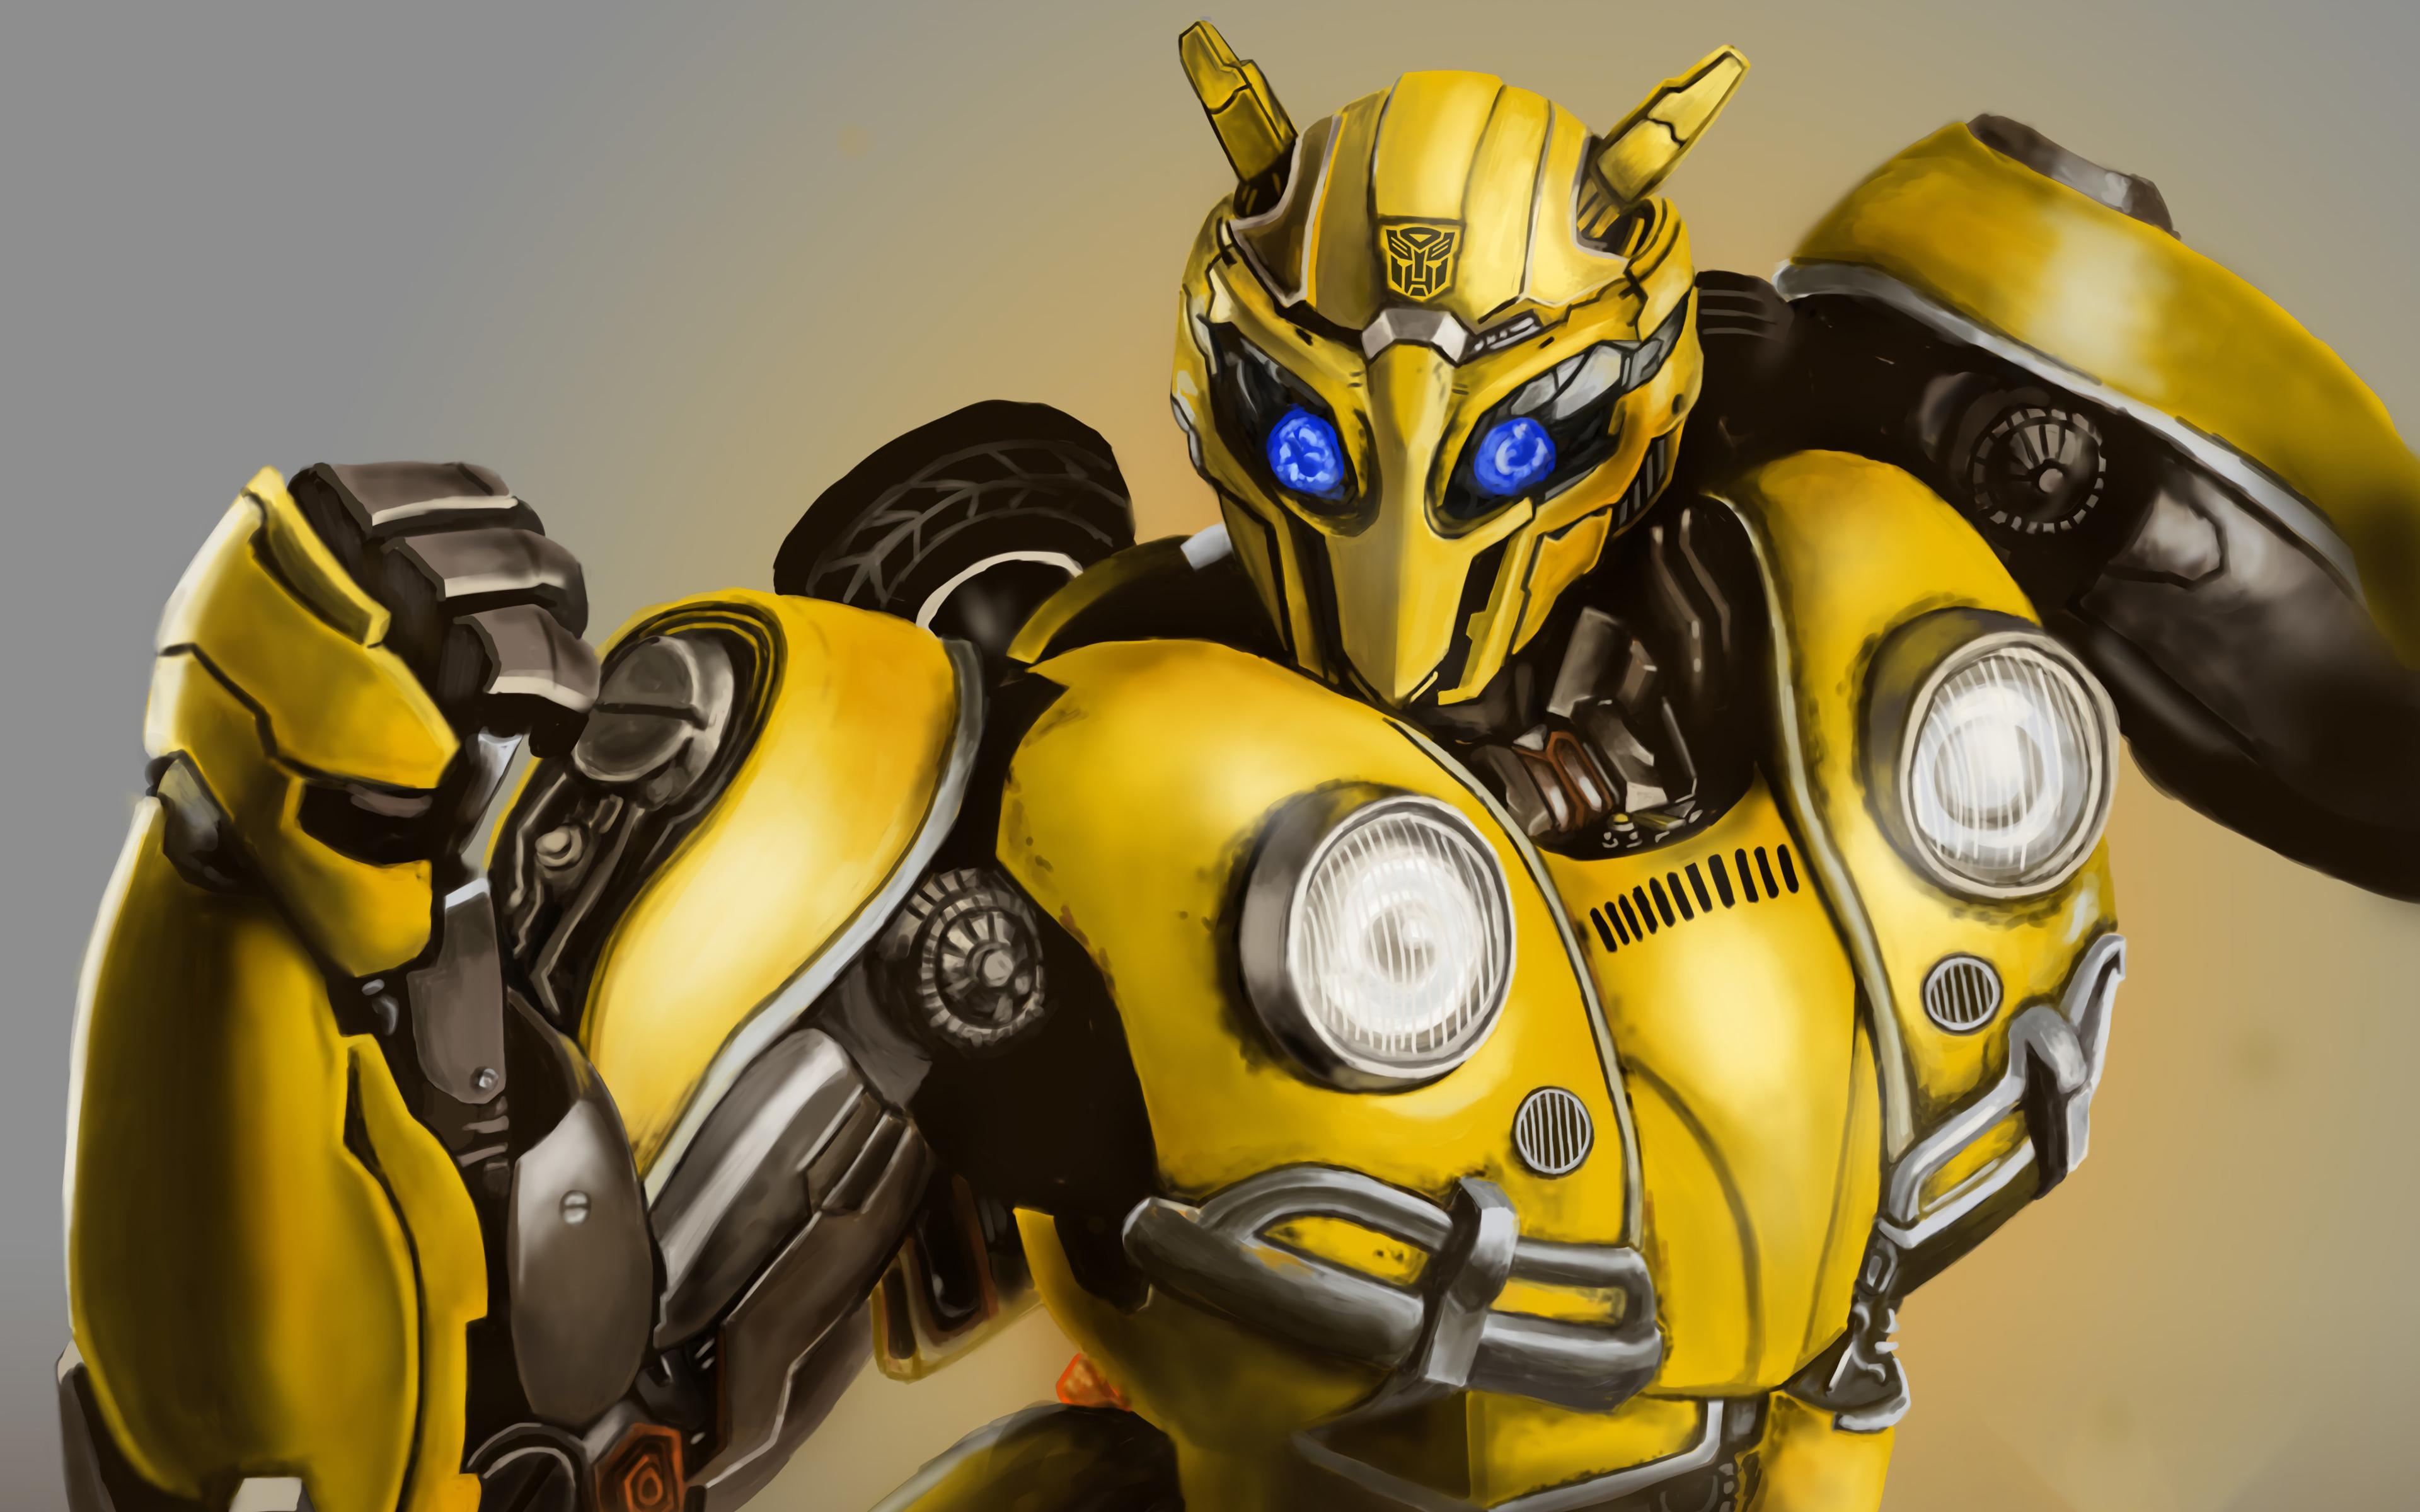 bumblebee-4k-new-2019-4o.jpg